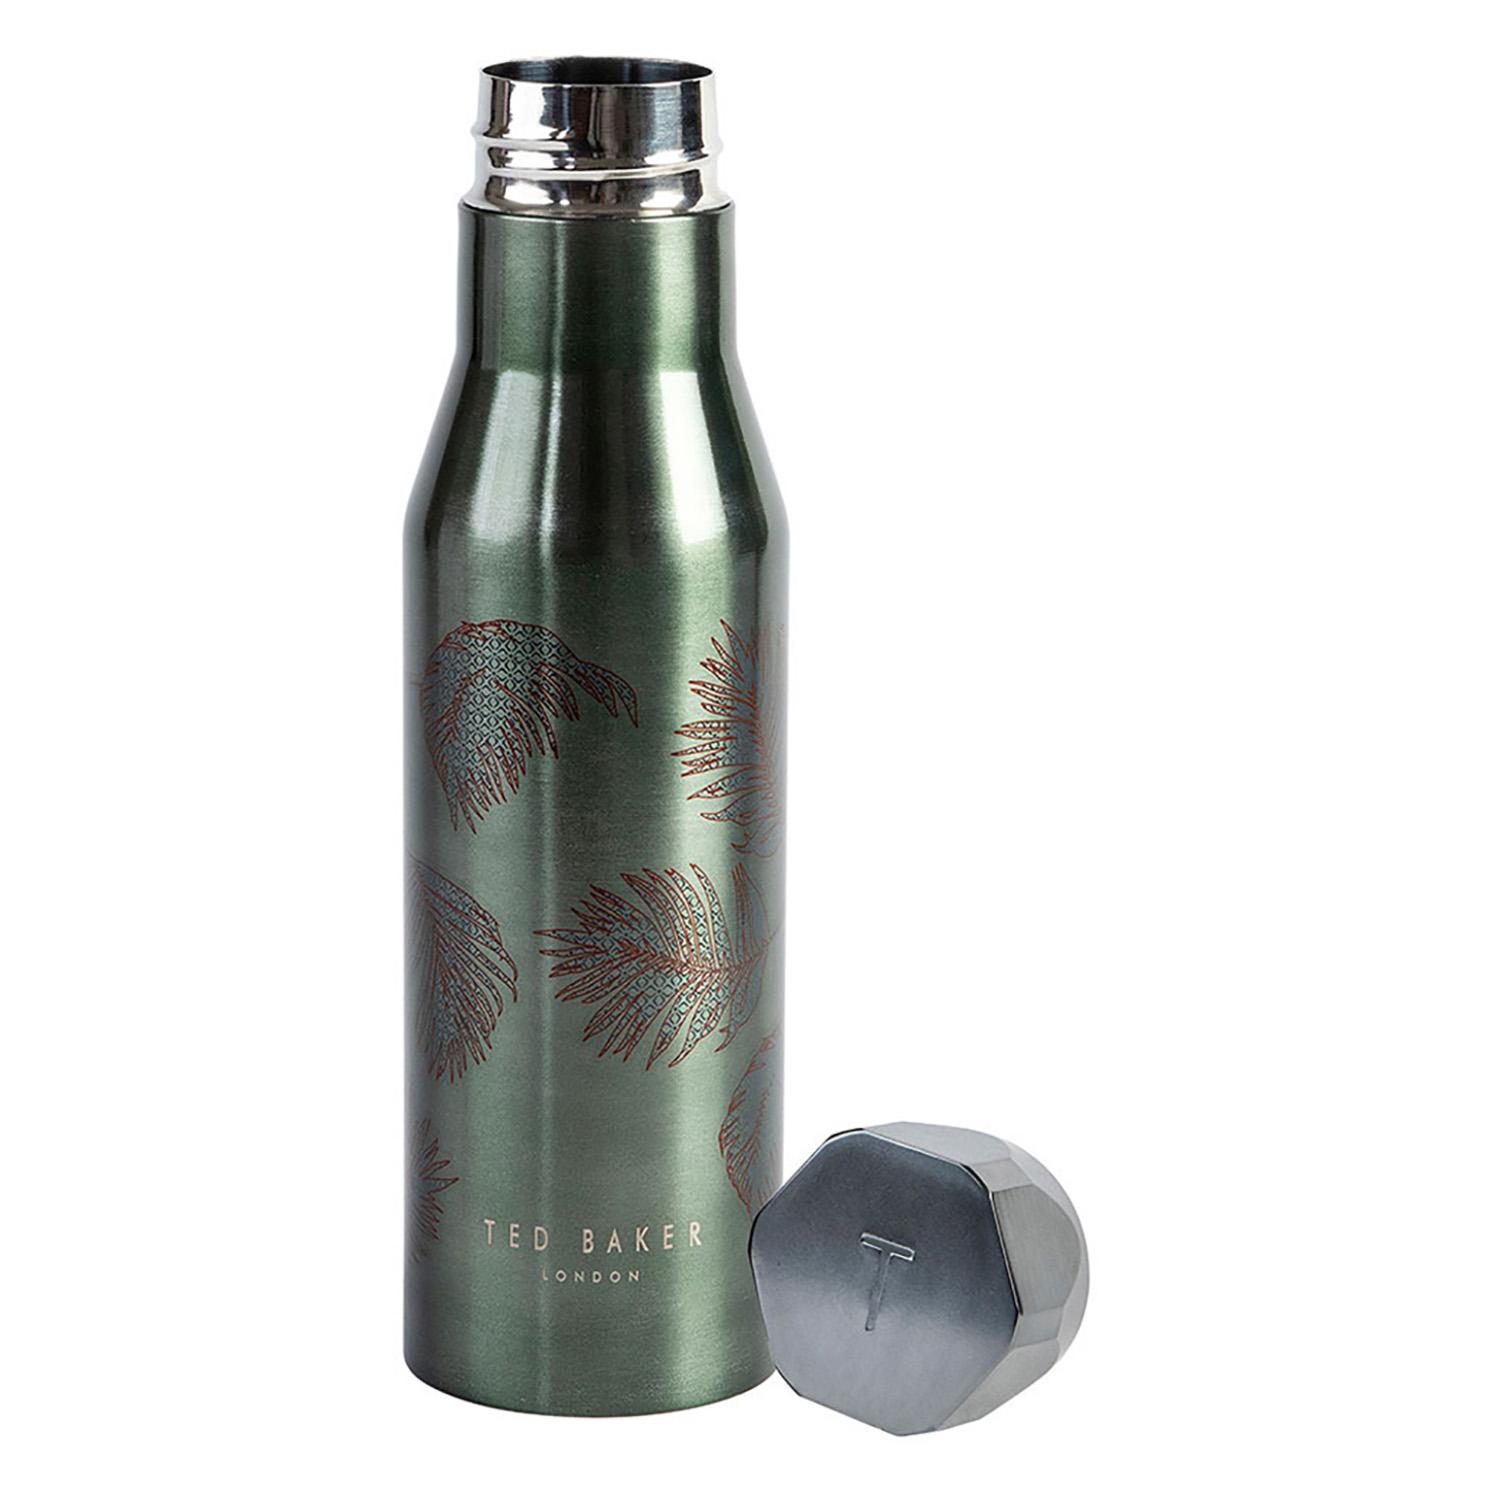 Ted Baker – Khaki & Palm Stainless Steel Hexagonal Lid Insulated Water Bottle